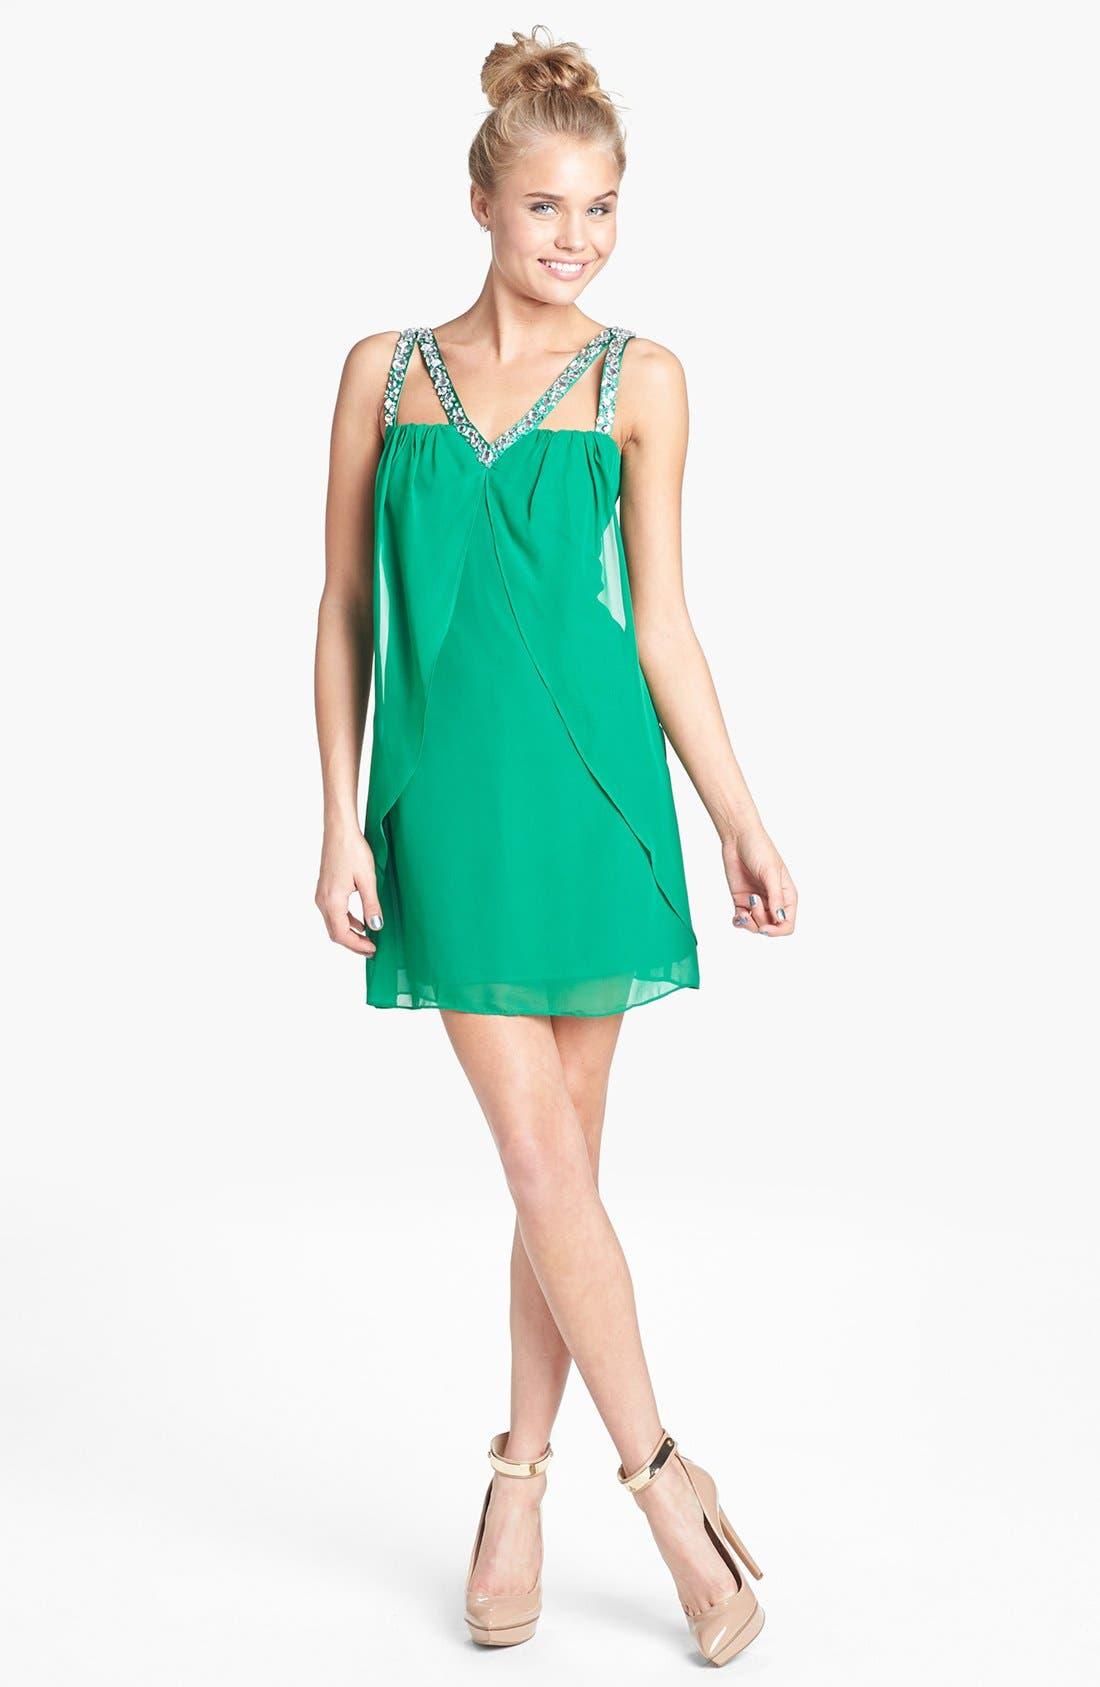 Alternate Image 1 Selected - Hailey Logan Jeweled V-Neck Dress (Juniors) (Online Only)